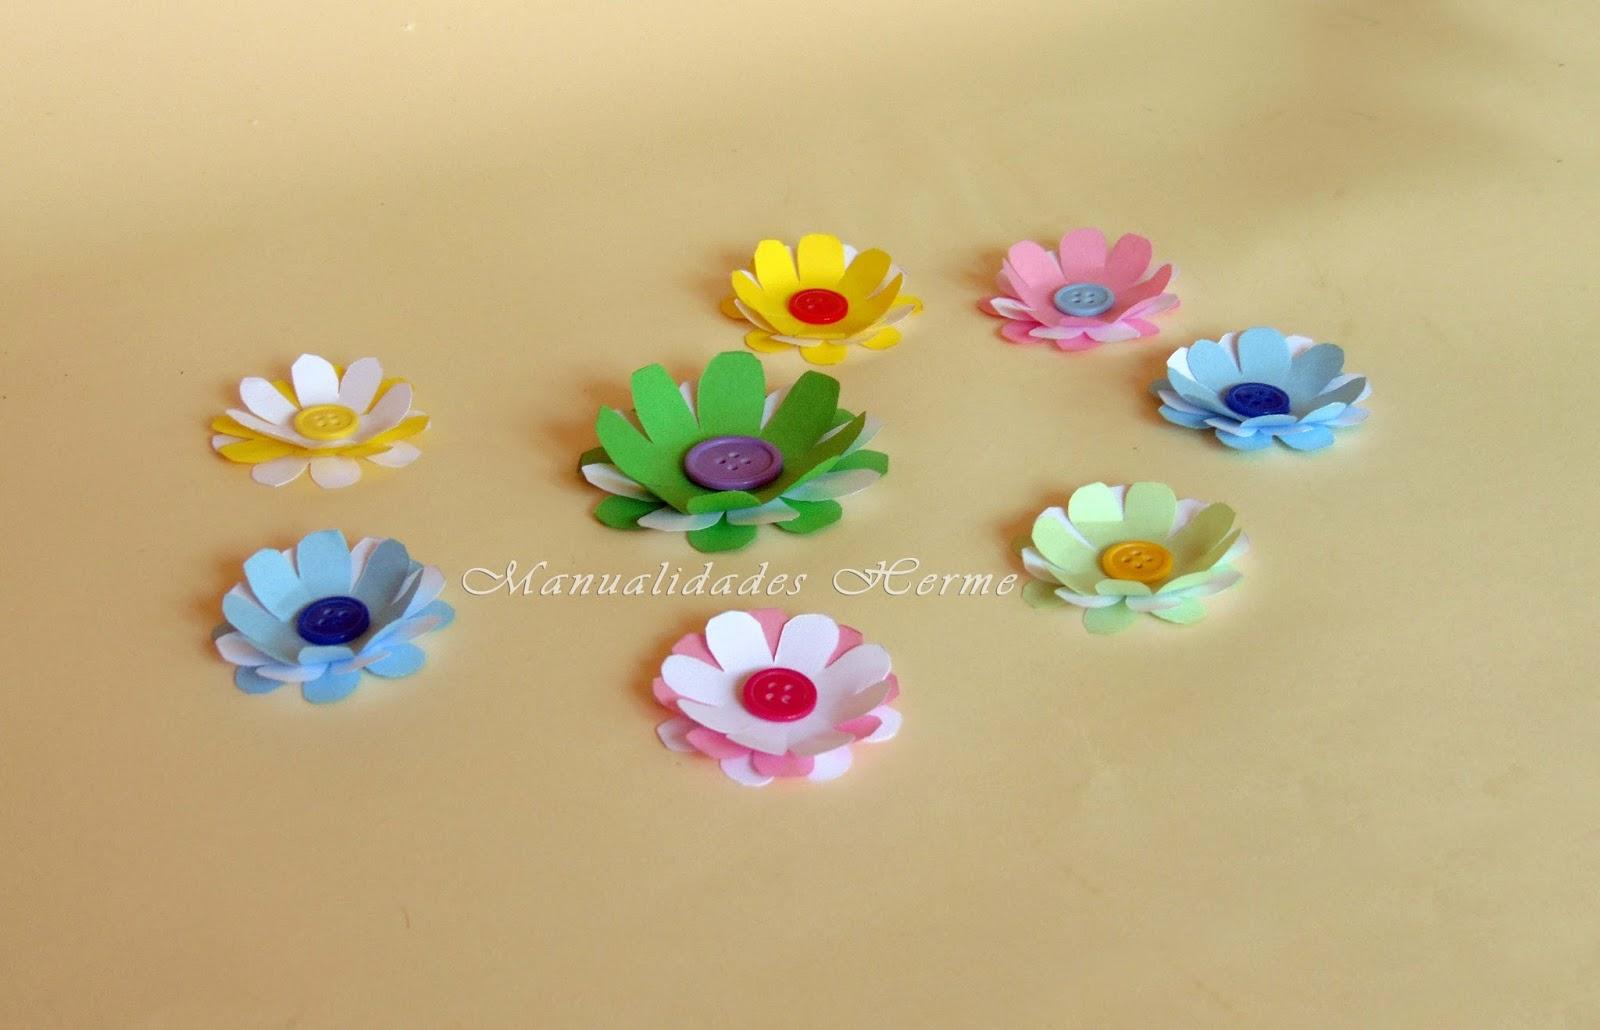 Manualidades herme como hacer flores de papel paso a paso - Como hacer cadenetas de papel para fiestas ...